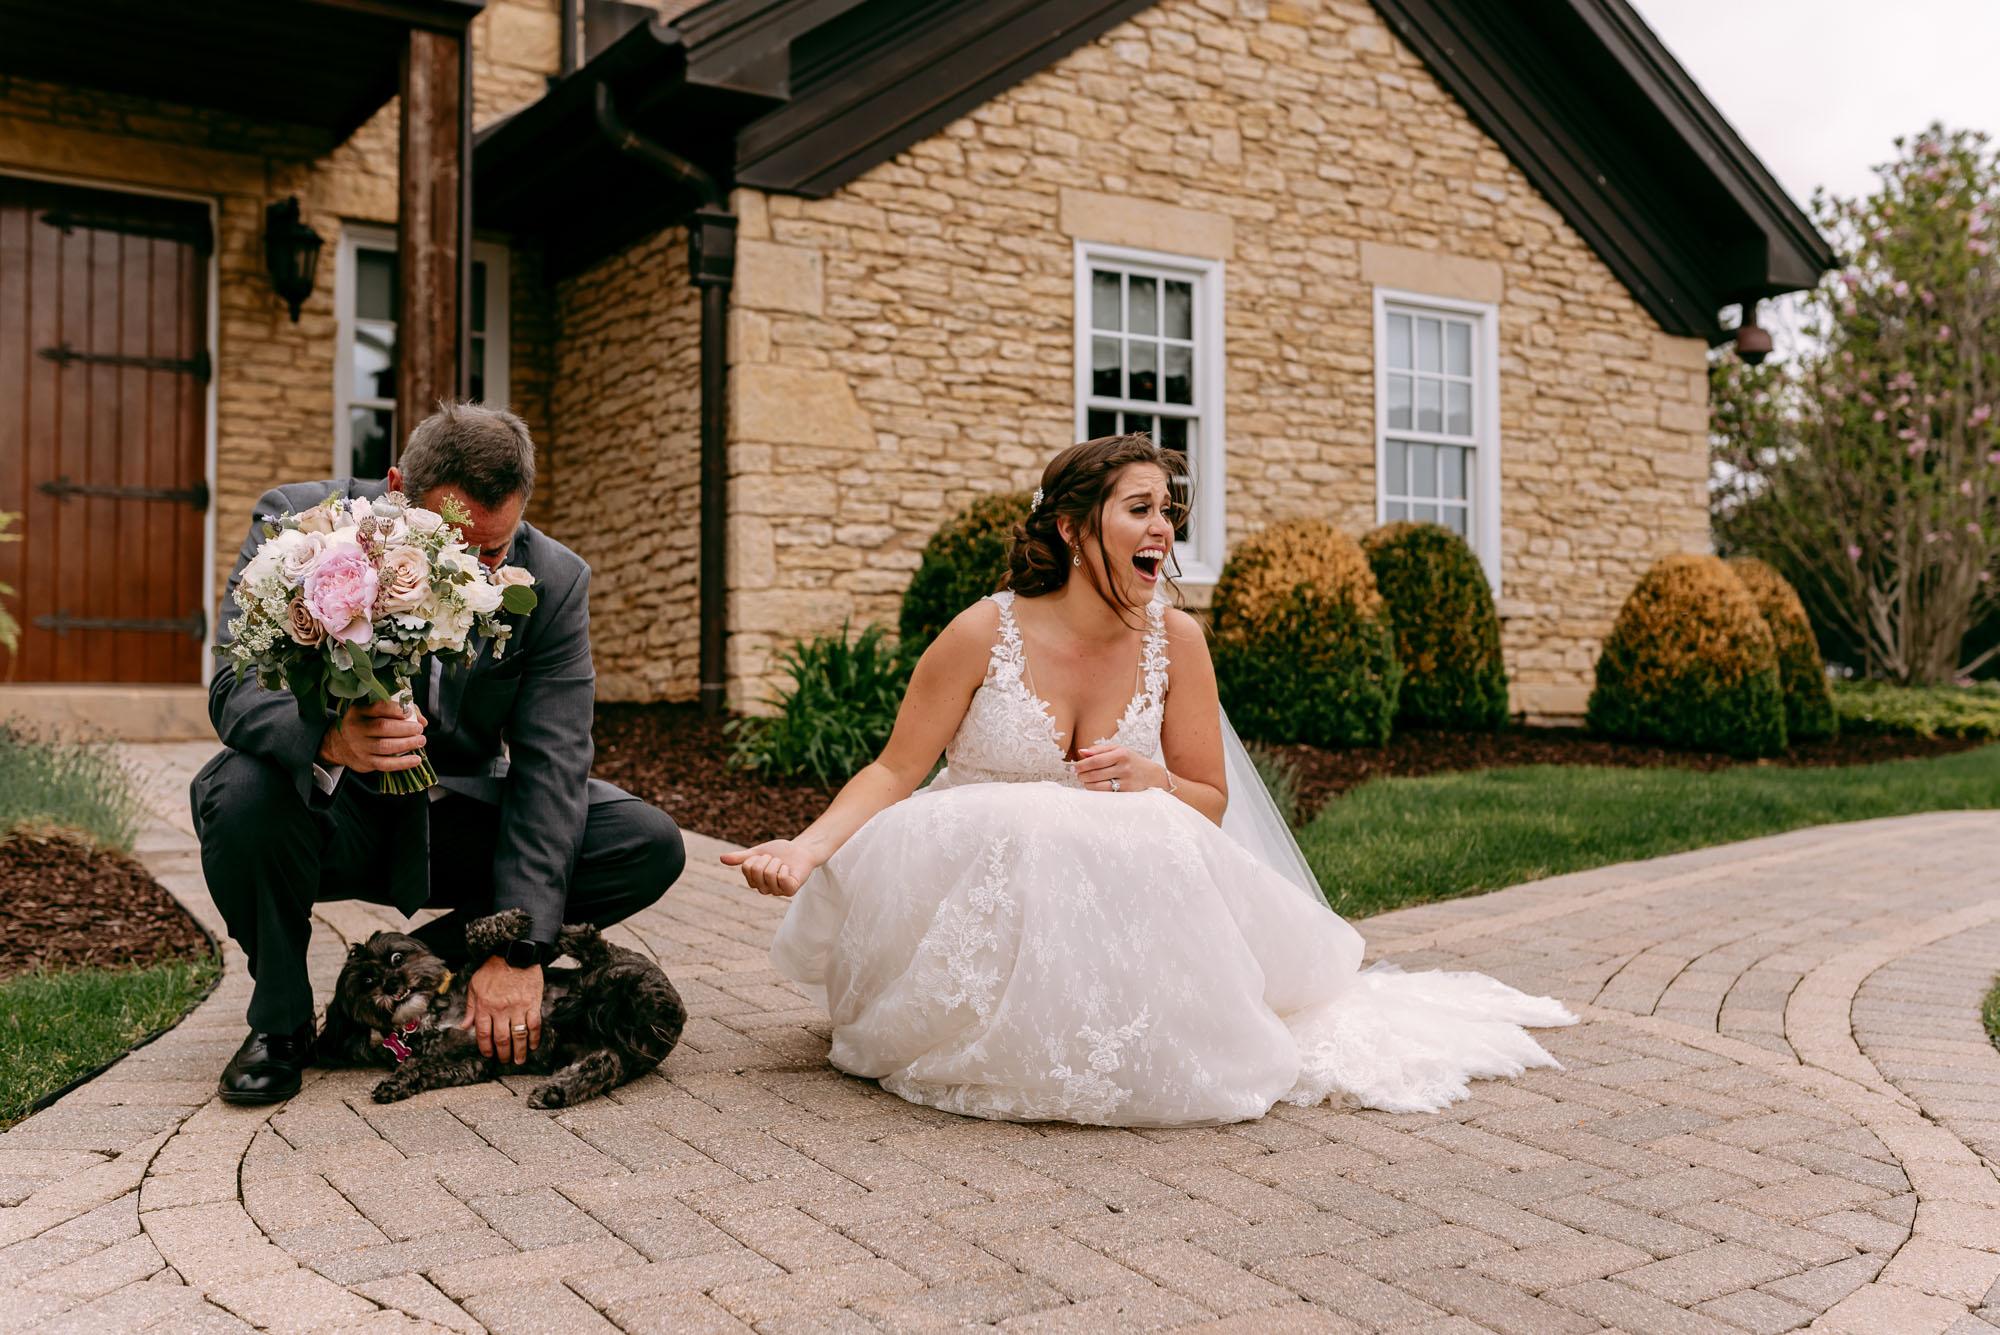 orchard-farms-pavillion-wedding-rockton-IL-wedding-photographers-217.jpg